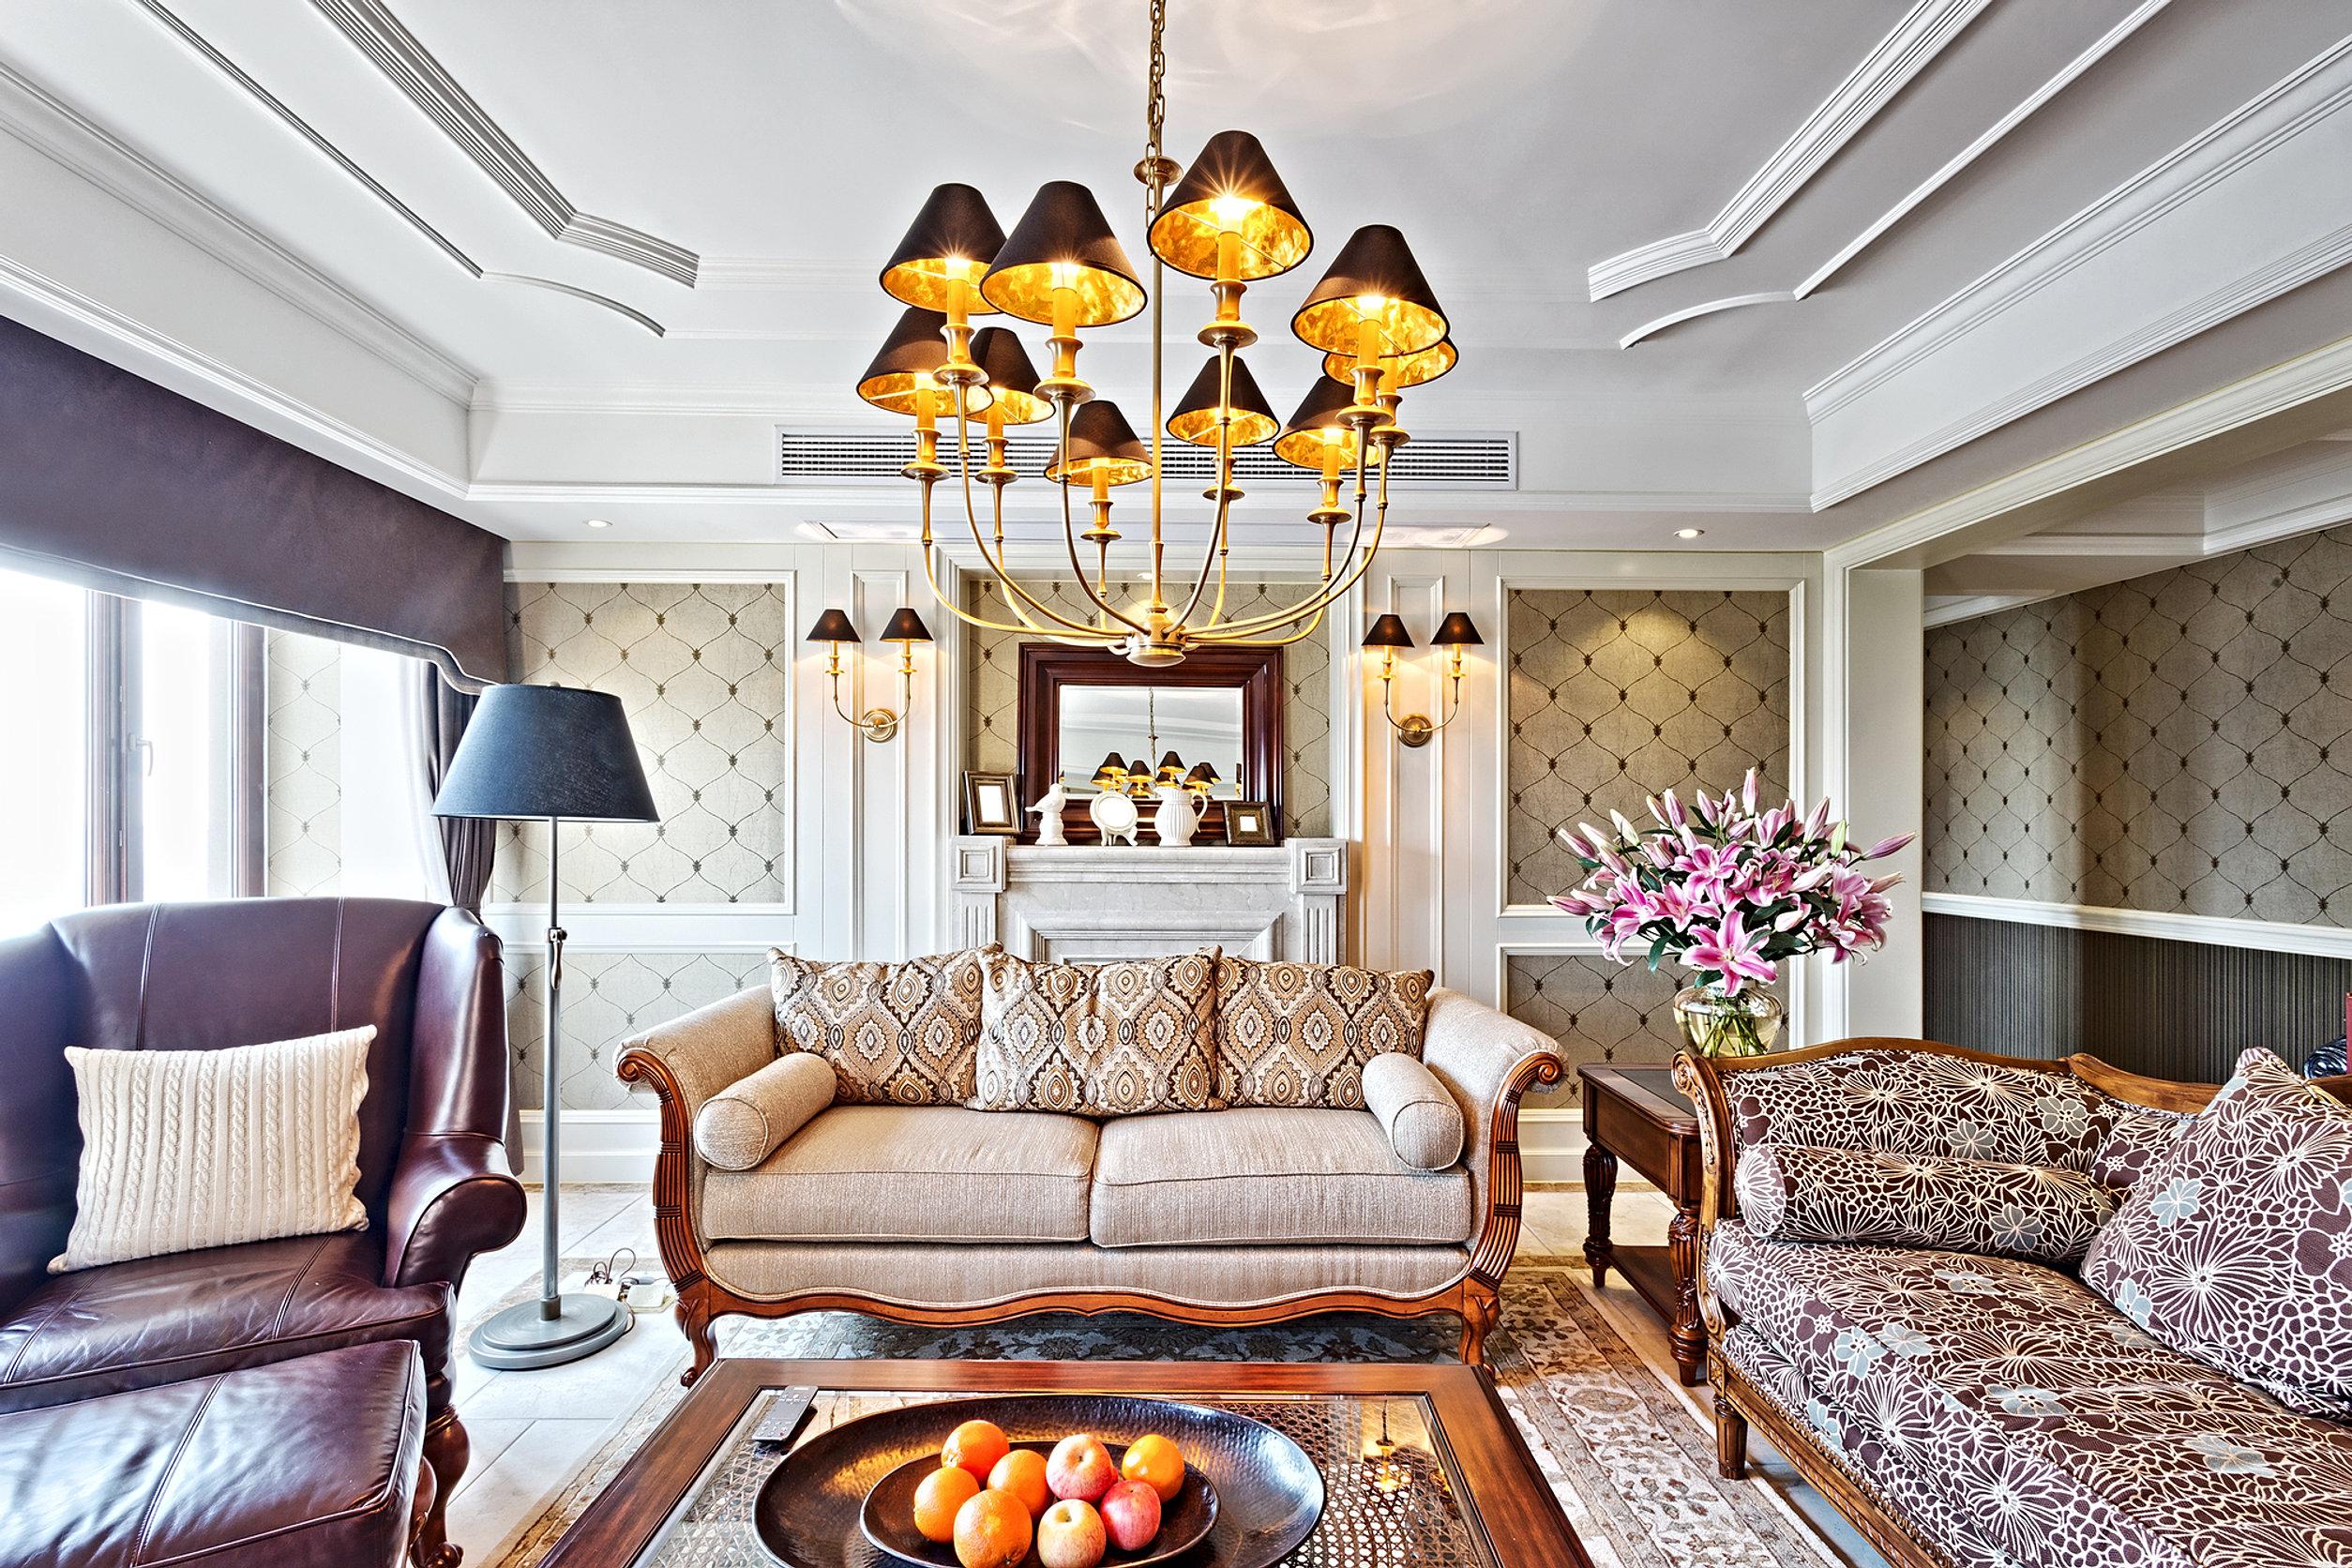 MiMo Home Jakarta Interior Designer and Decorator